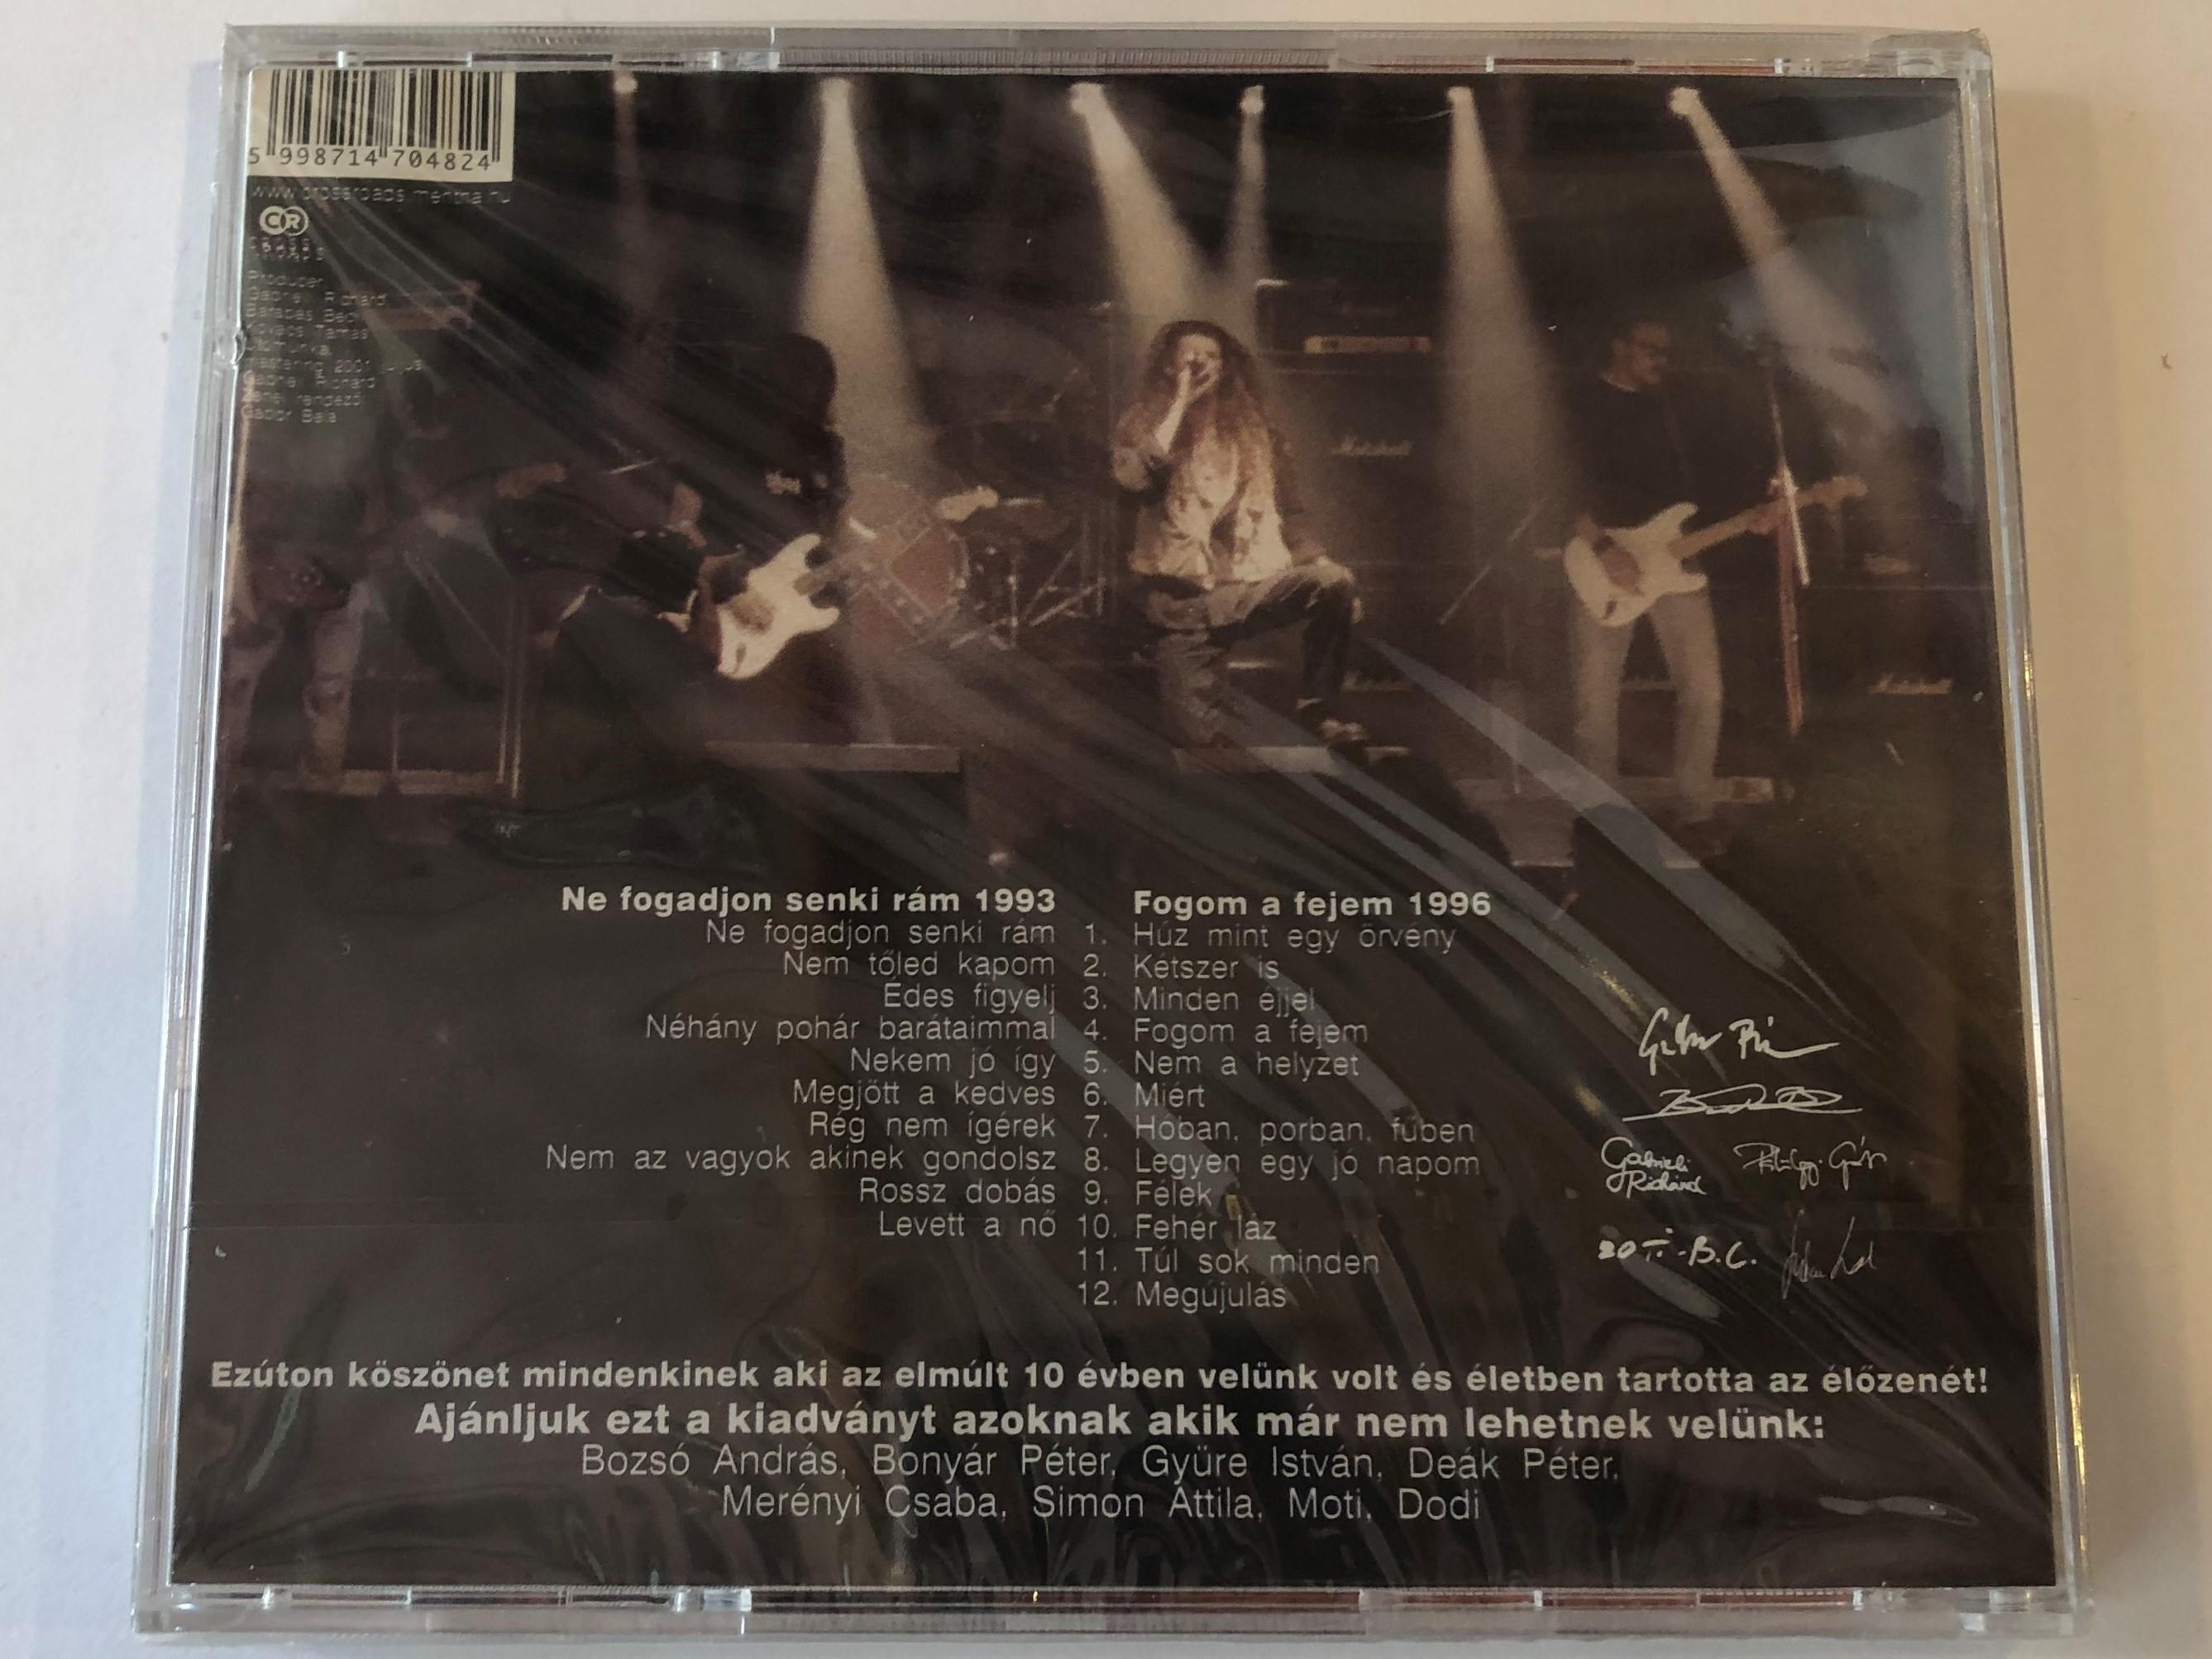 southern-special-ne-fogadjon-senki-r-m-fogom-a-fejem-1996-crossroads-records-audio-cd-2001-crcd-048-2-2-.jpg